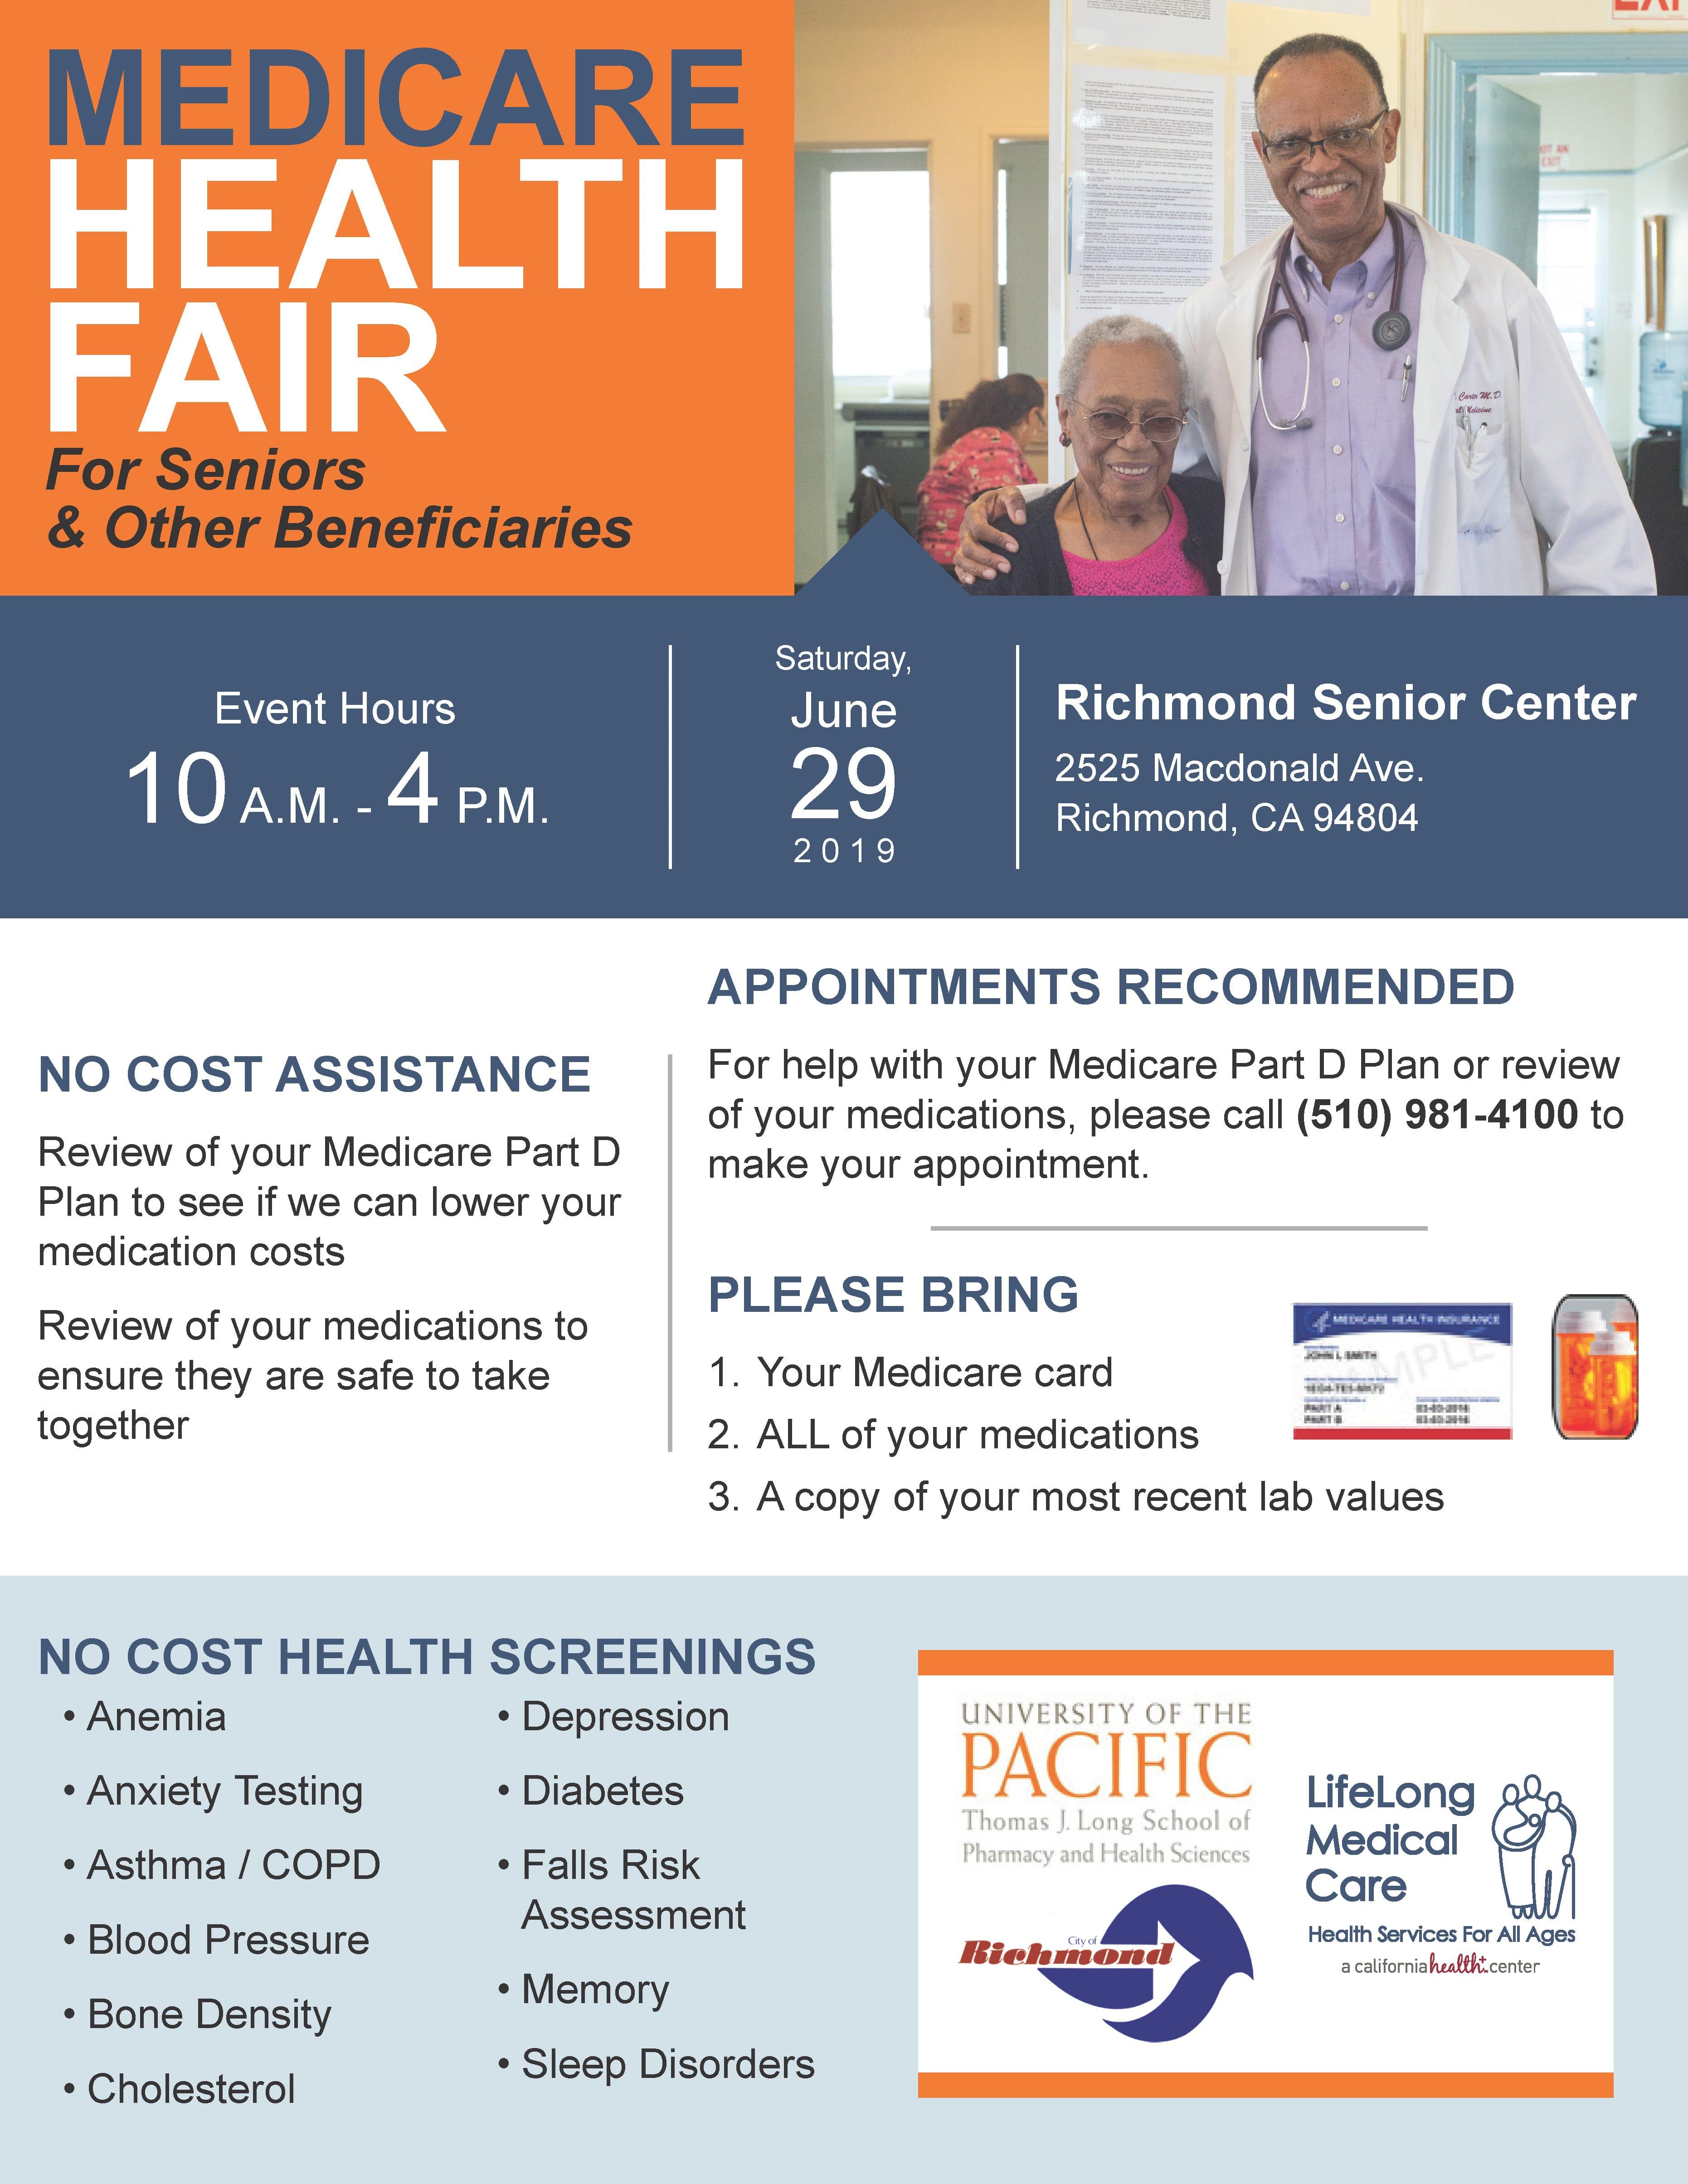 Flyer for Medicare Health Fair at Richmond Senior Center on 6/29/2019